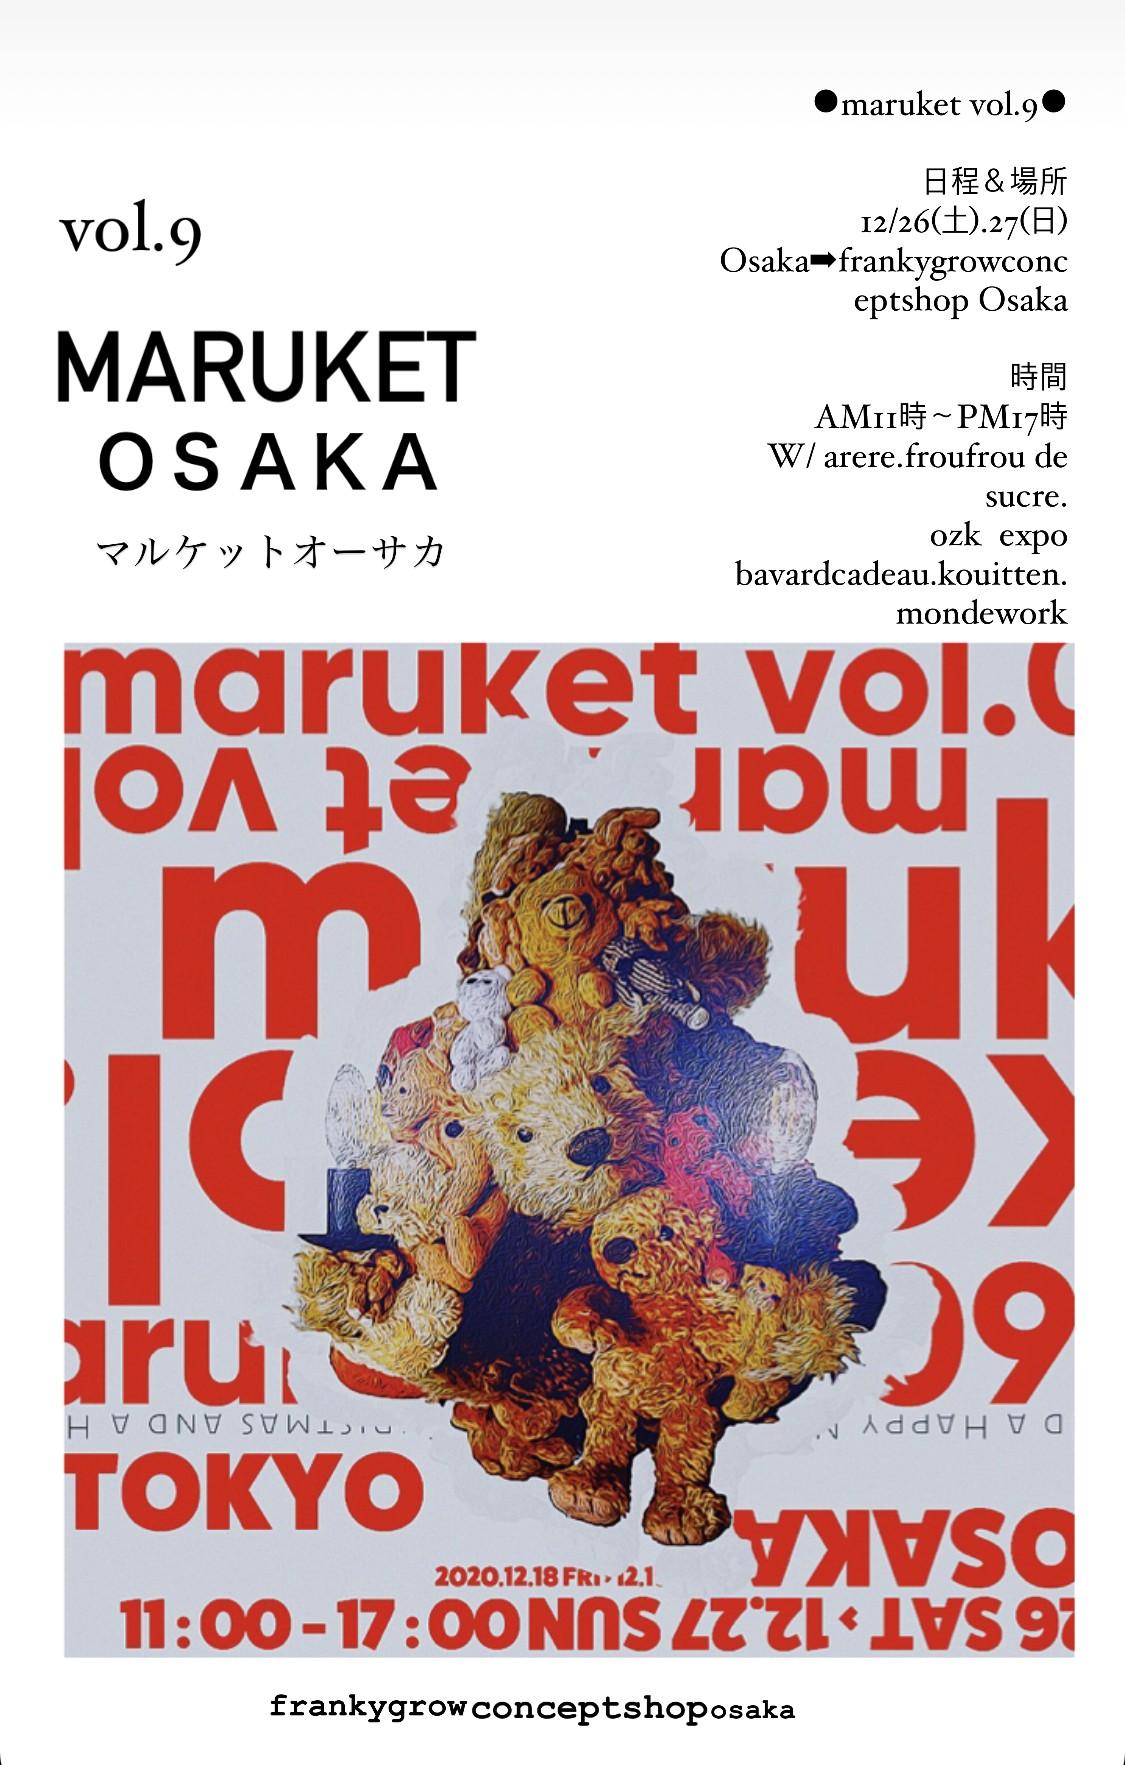 maruket vol.9 at frankygrowconceptshop Osaka